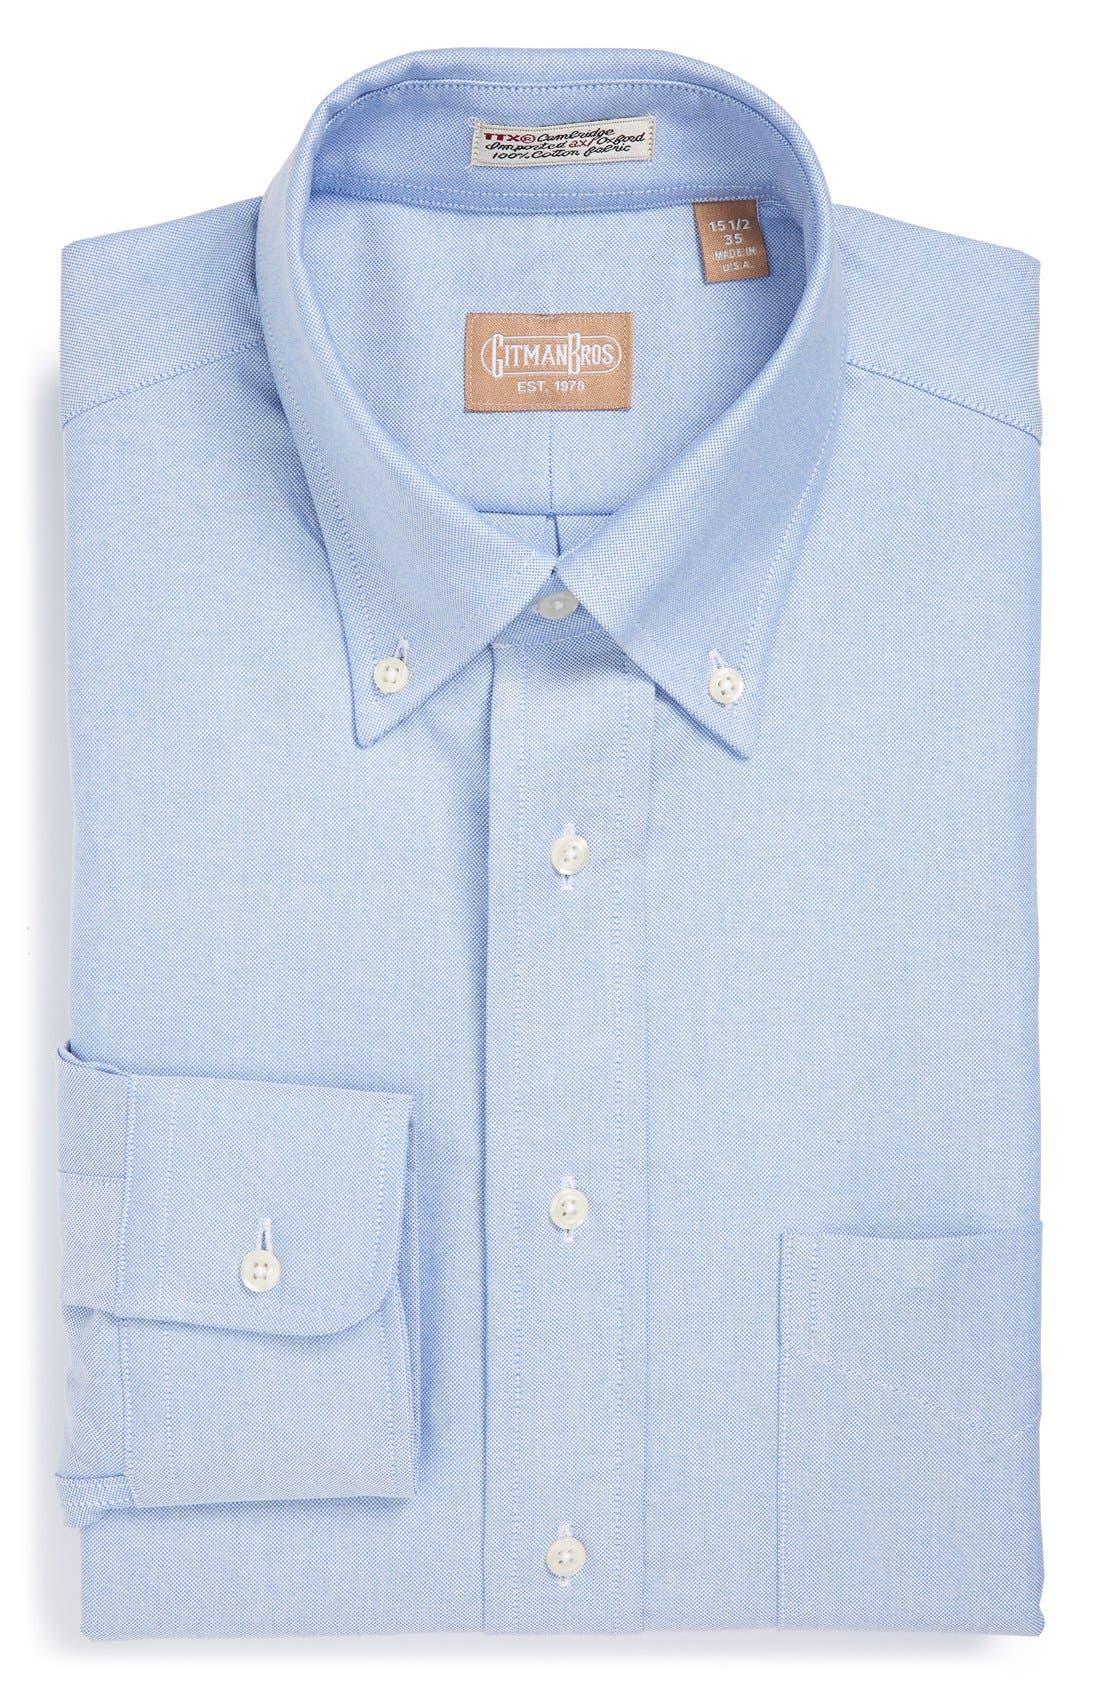 'Cambridge Oxford' Regular Fit Dress Shirt,                             Main thumbnail 1, color,                             BLUE